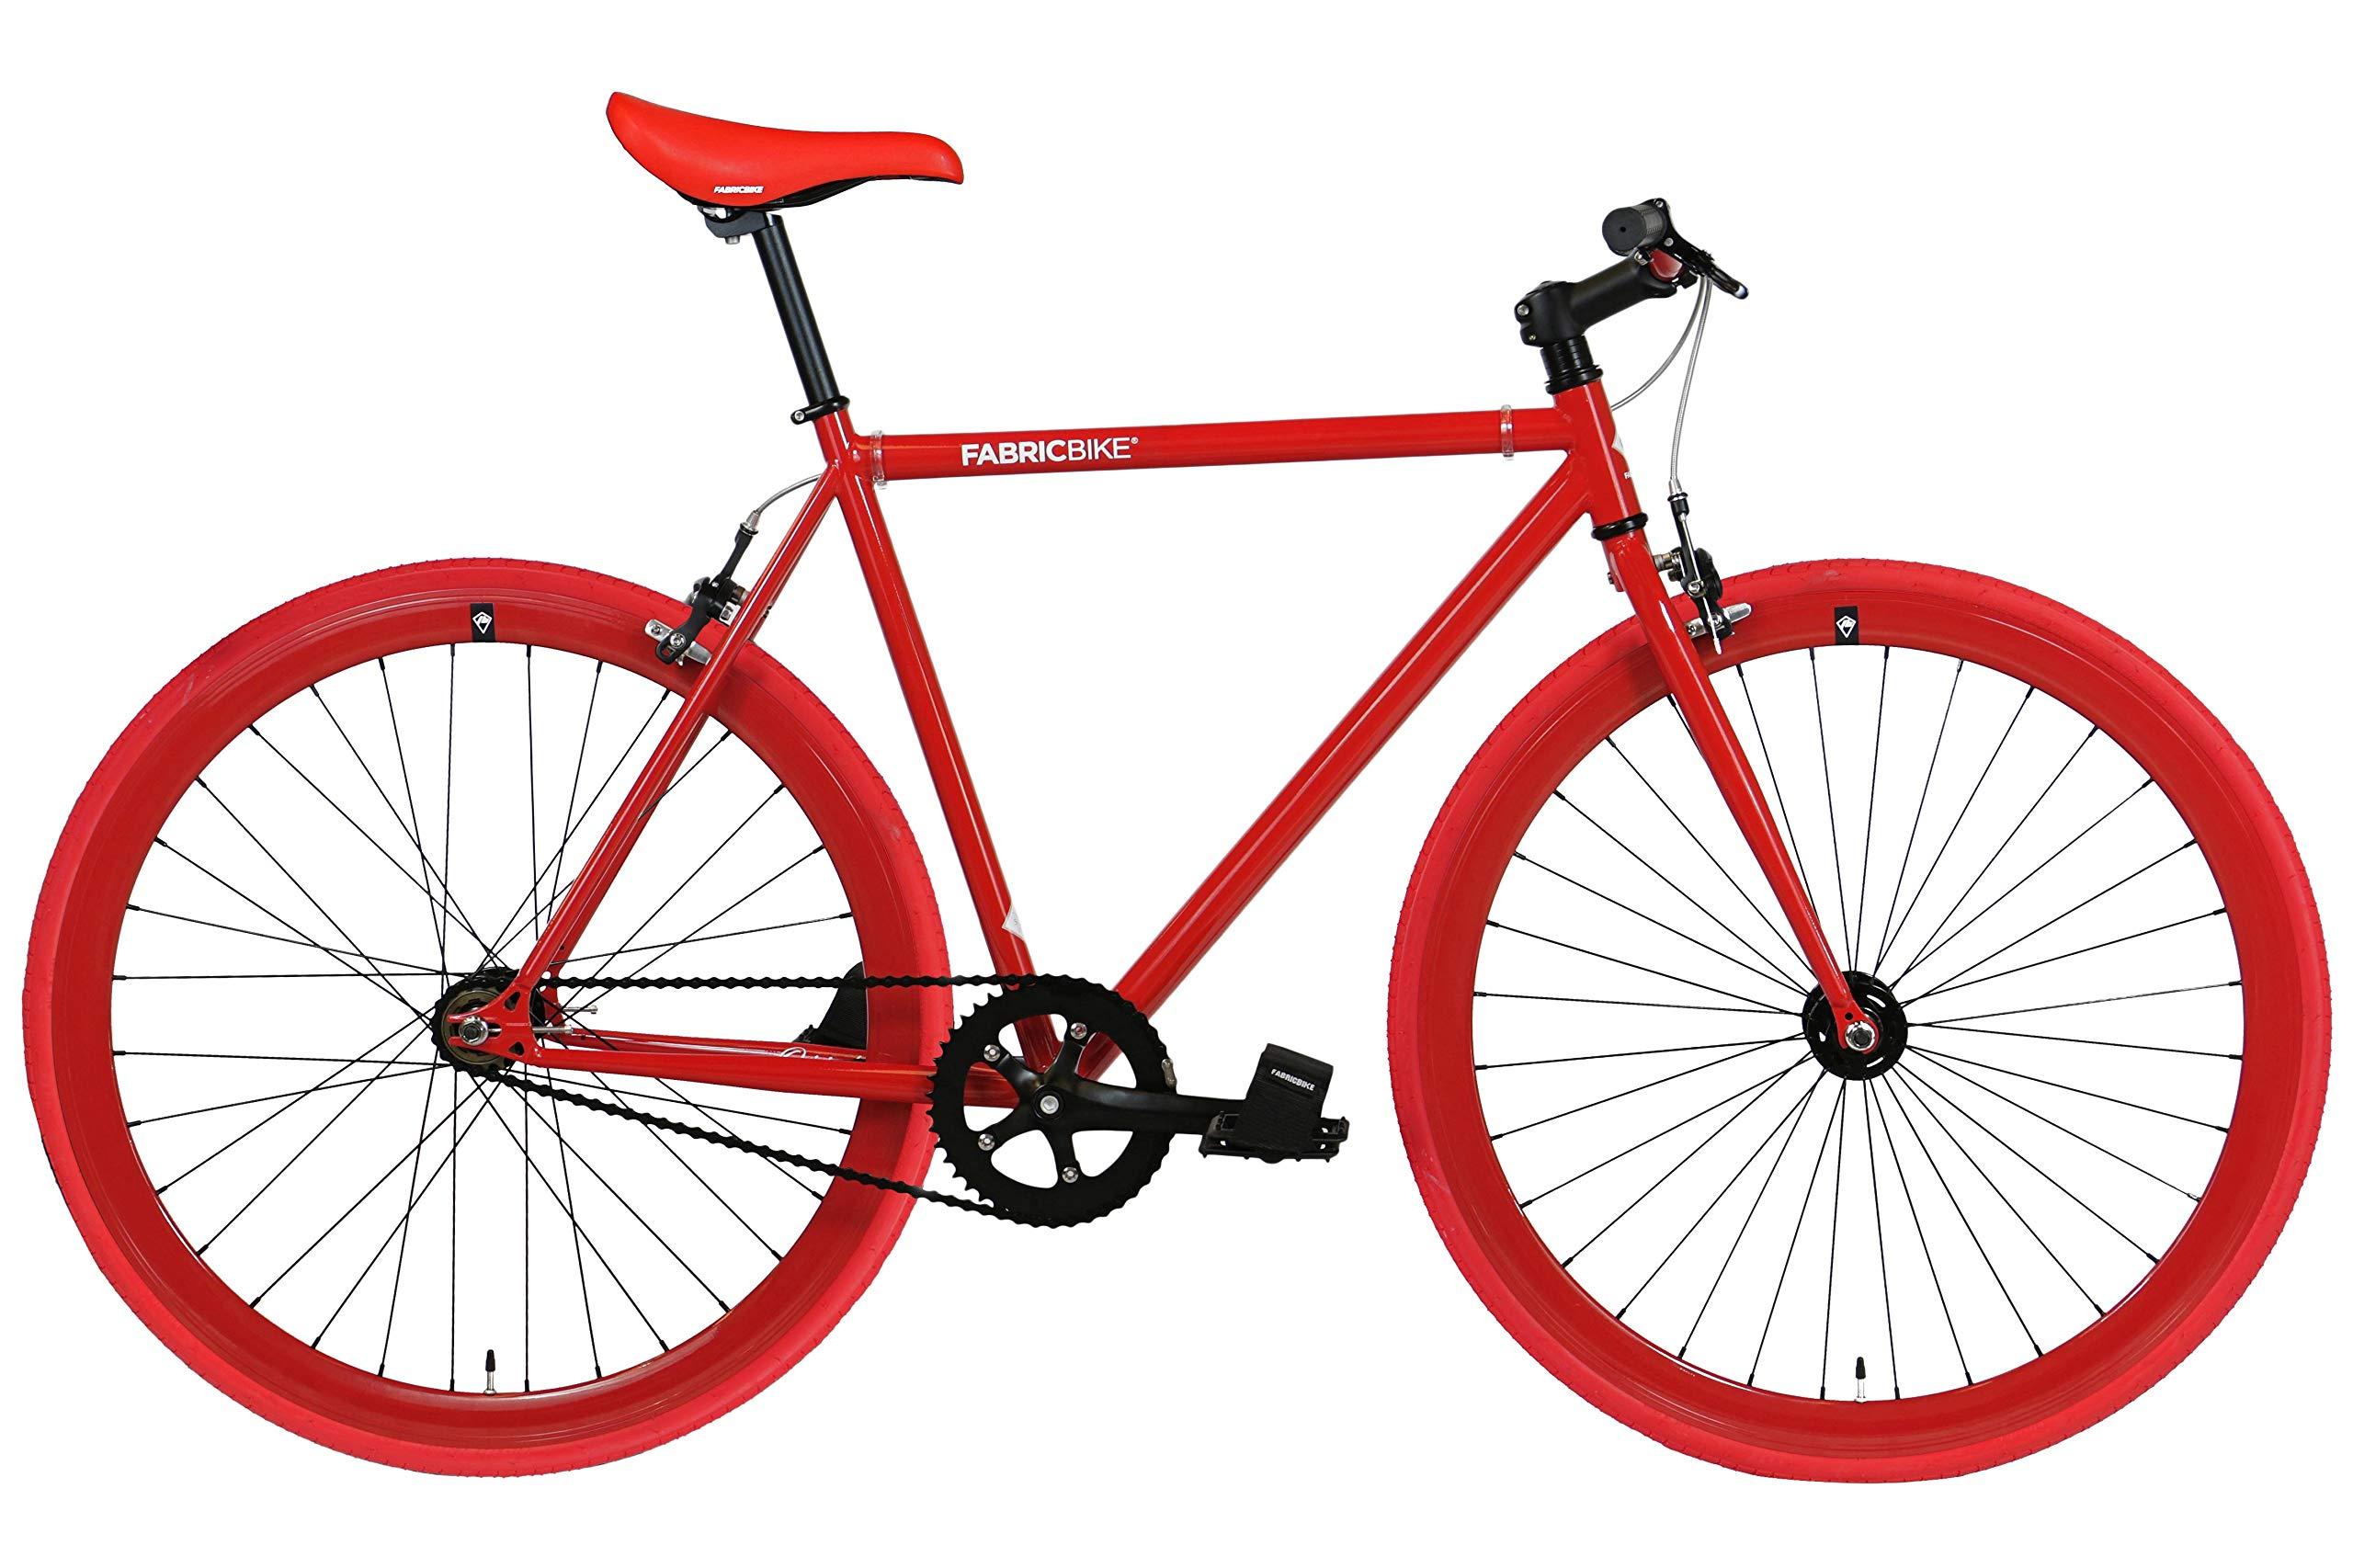 FabricBike- Bicicleta Fixie Blanca, piñon Fijo, Single Speed, Cuadro Hi-Ten Acero, 10Kg (S-49cm, Fully Glossy Red): Amazon.es: Deportes y aire libre